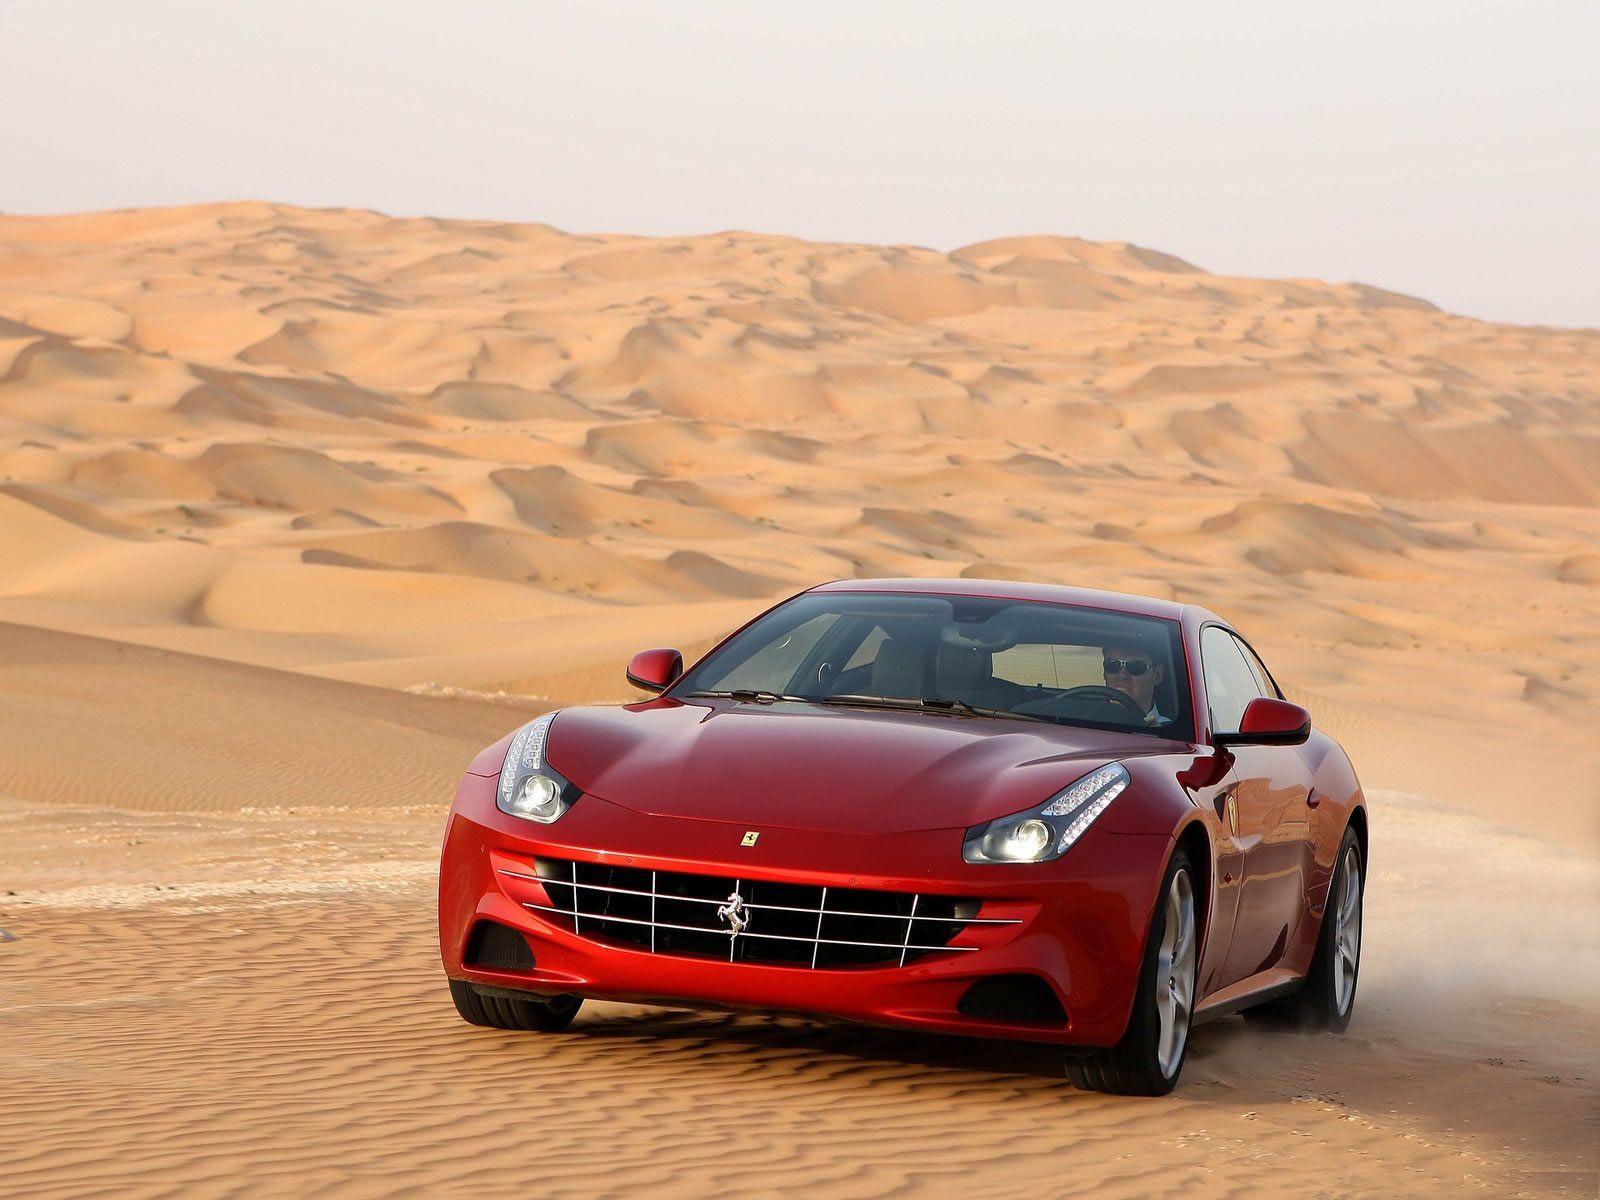 Ferrari FF Wallpaper